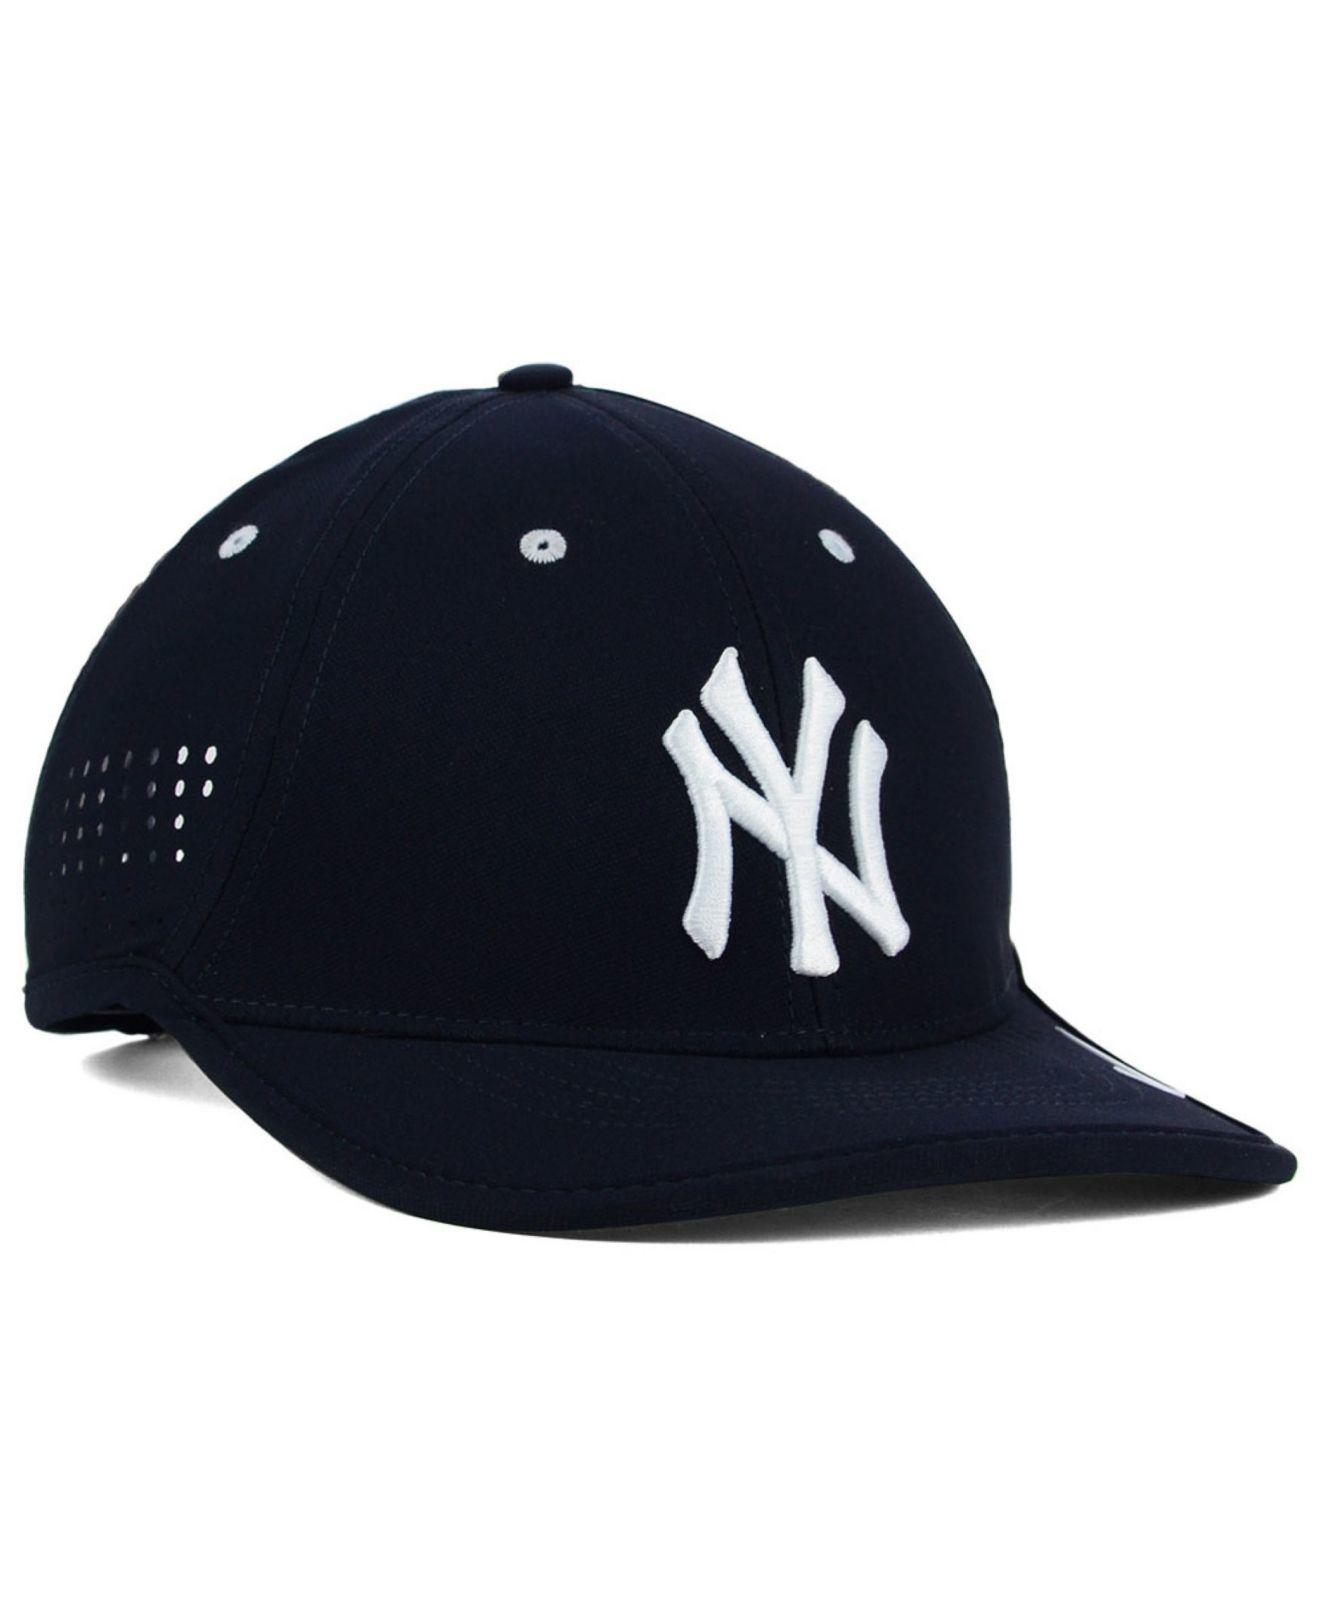 Lyst - Nike New York Yankees Vapor Swoosh Adjustable Cap in Blue for Men c0208d104f0